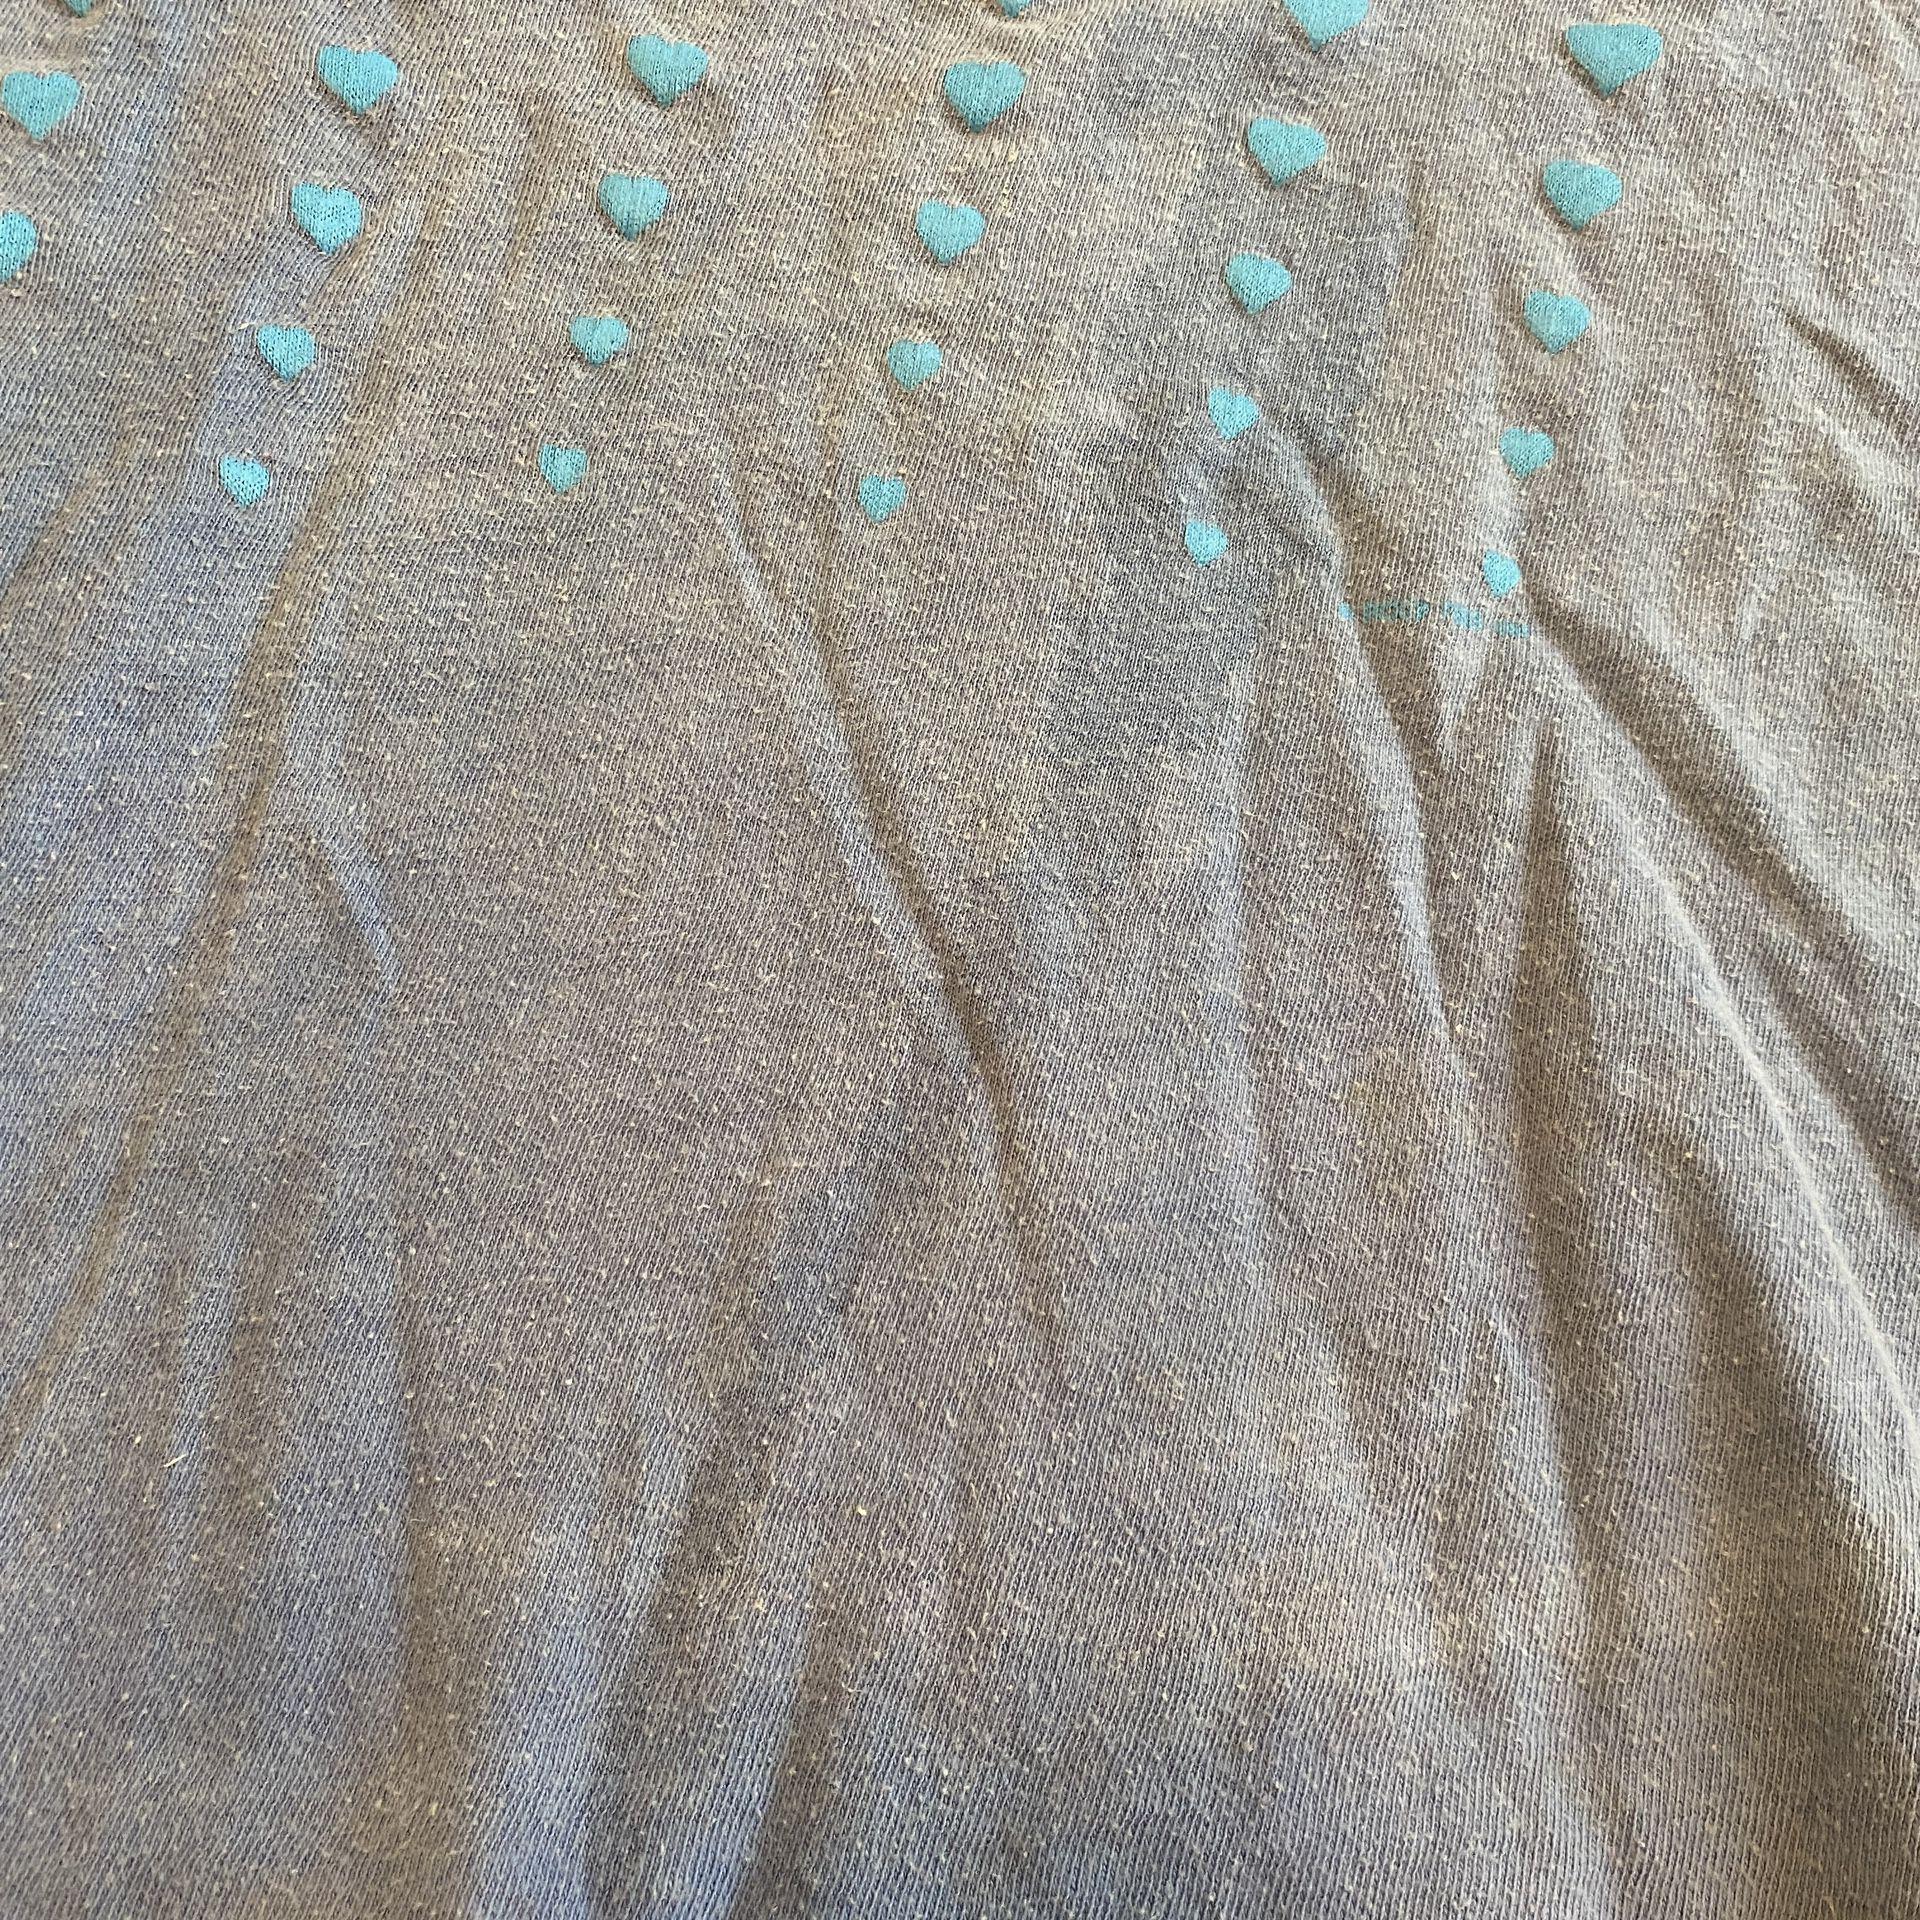 Vintage 90's Oregon Hearts Cropped T-Shirt Blue Single Stitched Size Medium